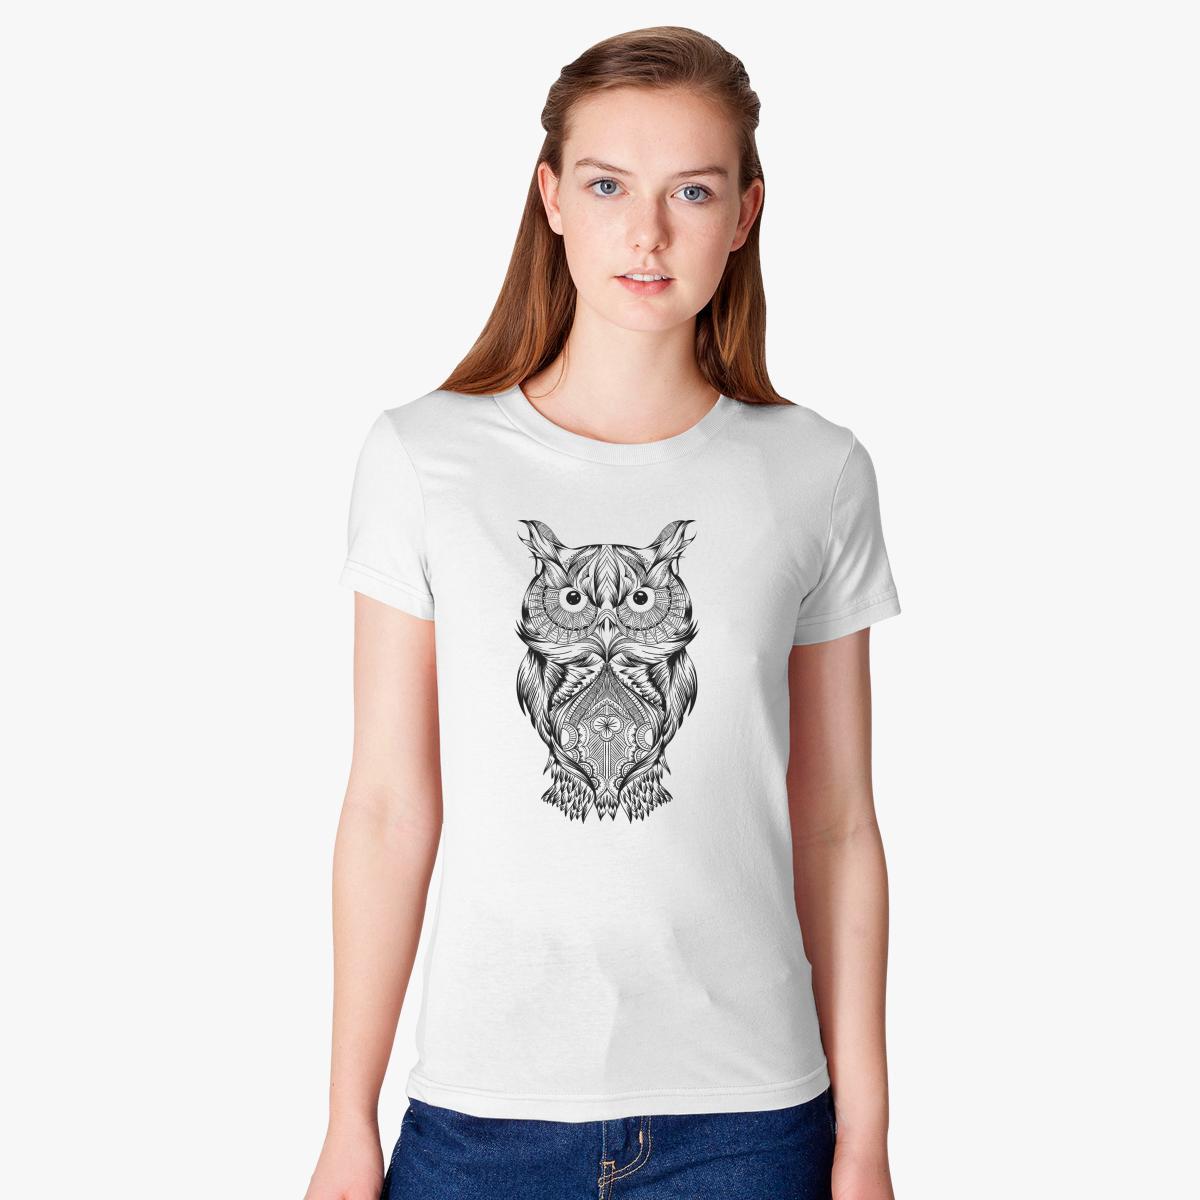 Buy Owl Women's T-shirt, 34297